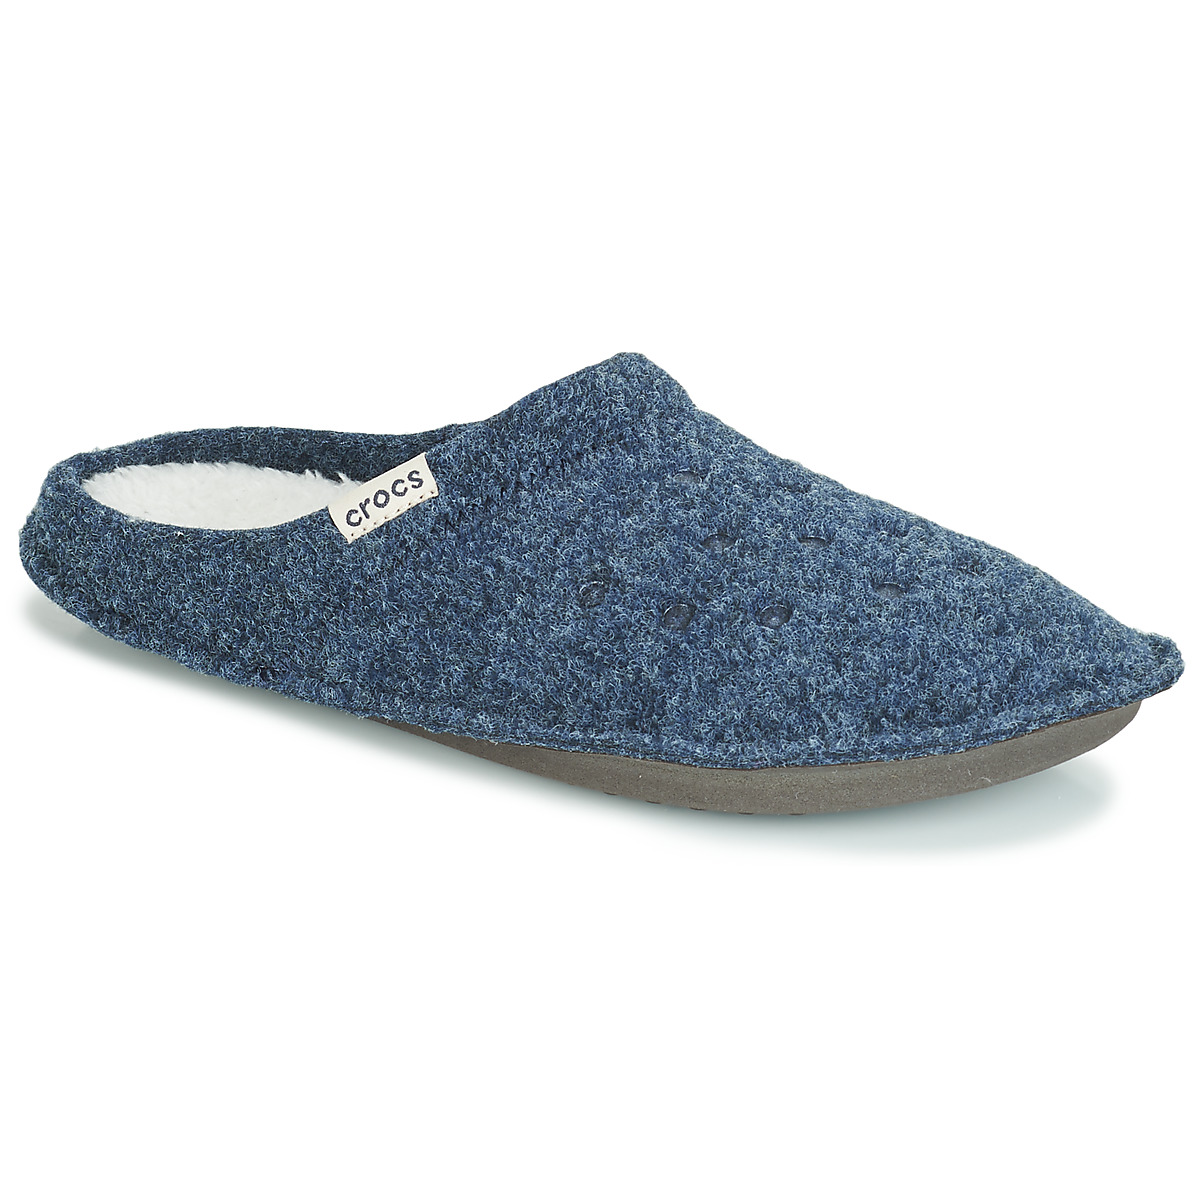 CROCS Swiftwater Zoccolo Pantofole Sandali Pantofole scarpe nuove